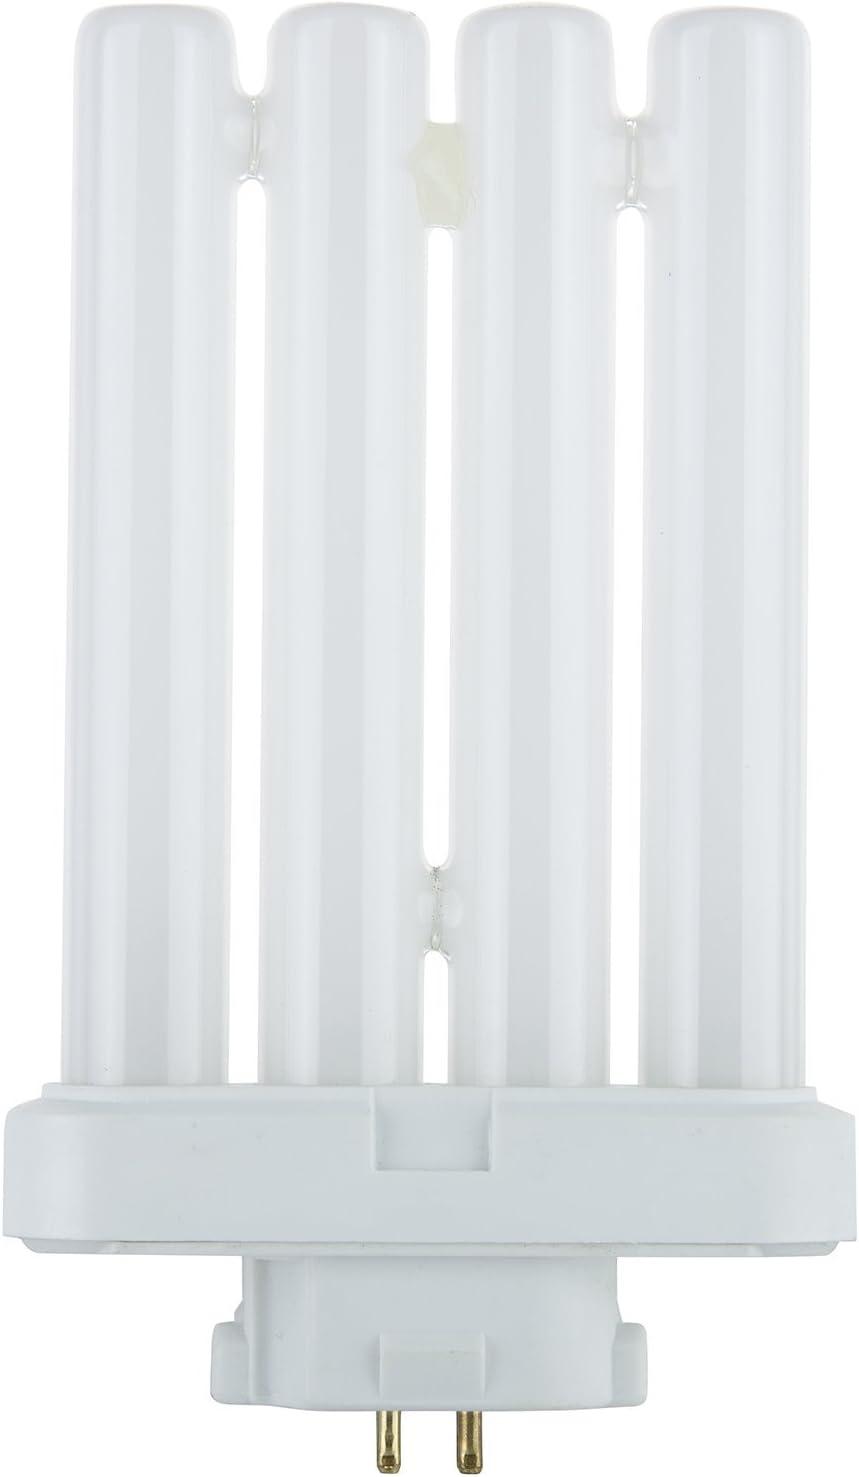 Sunlite FML27/65K/CD1 27-watt FML 4-Pin Quad Tube CFL Light Bulb, GX10Q-4 Base, Daylight